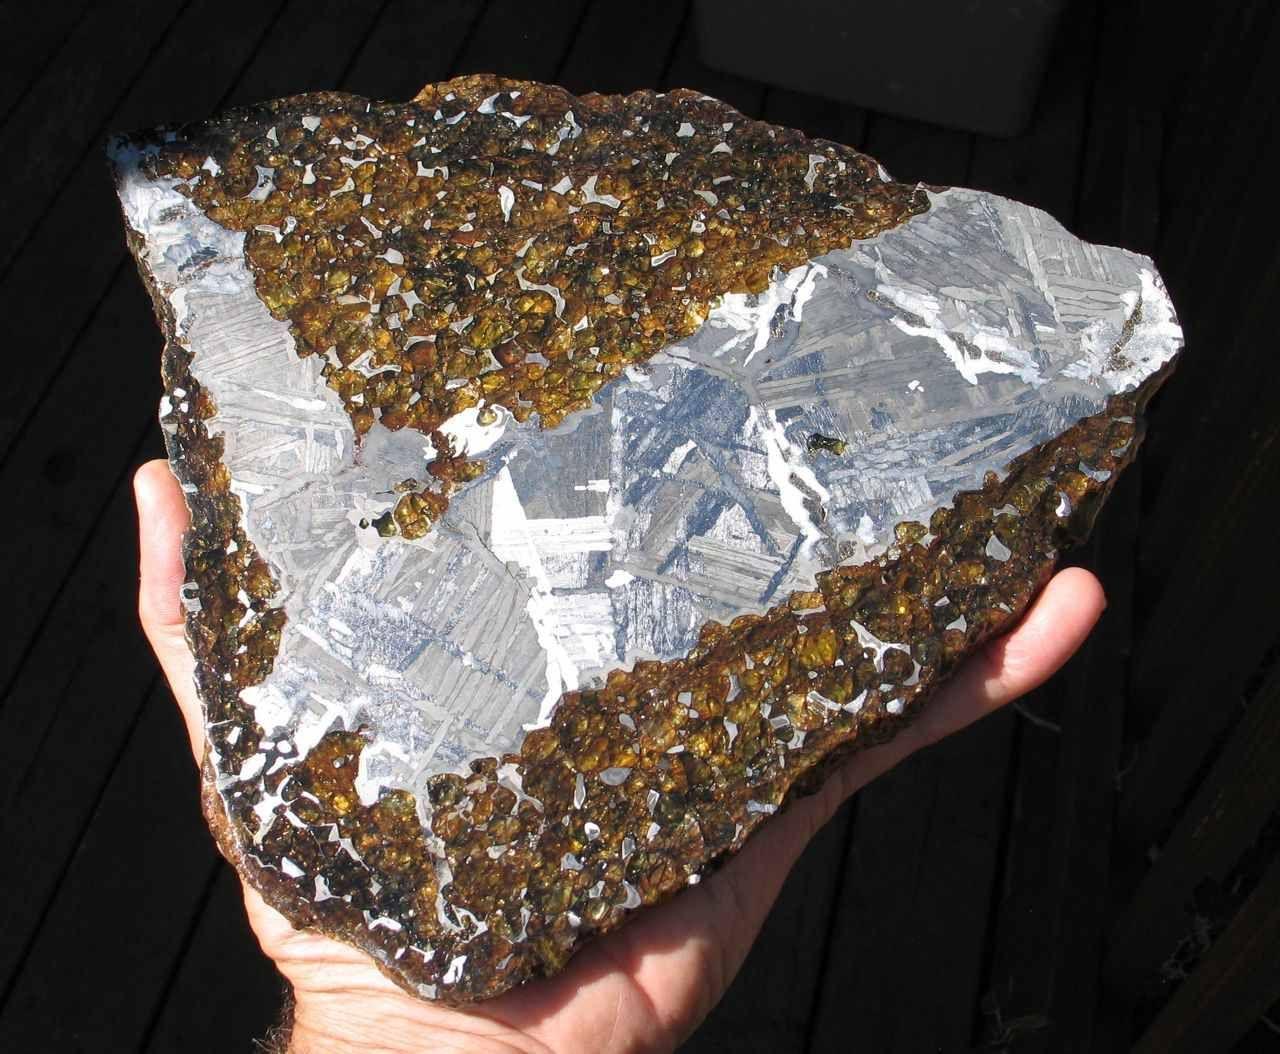 компания метеориты с оливином на камне фото своих